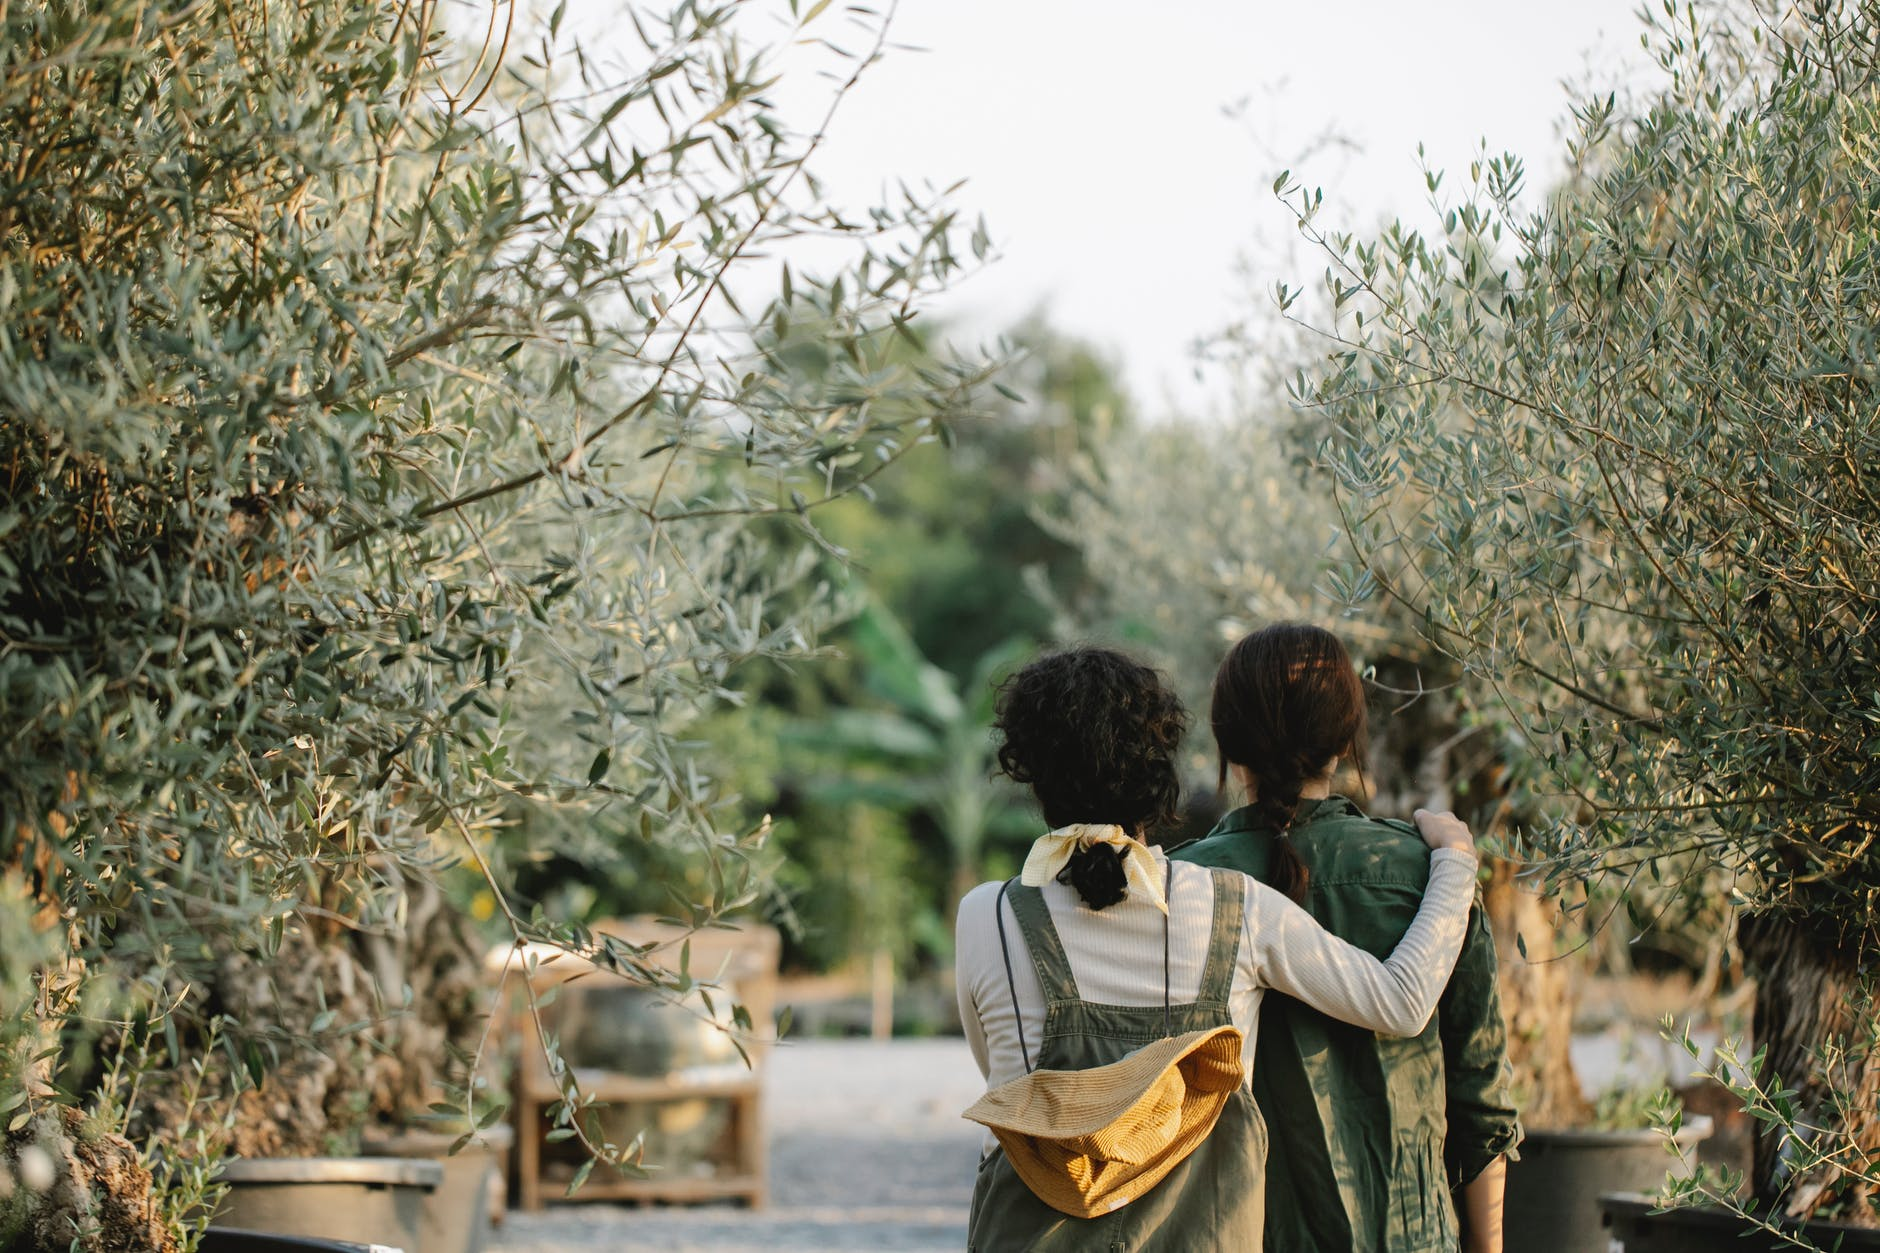 unrecognizable gardeners in botanical garden